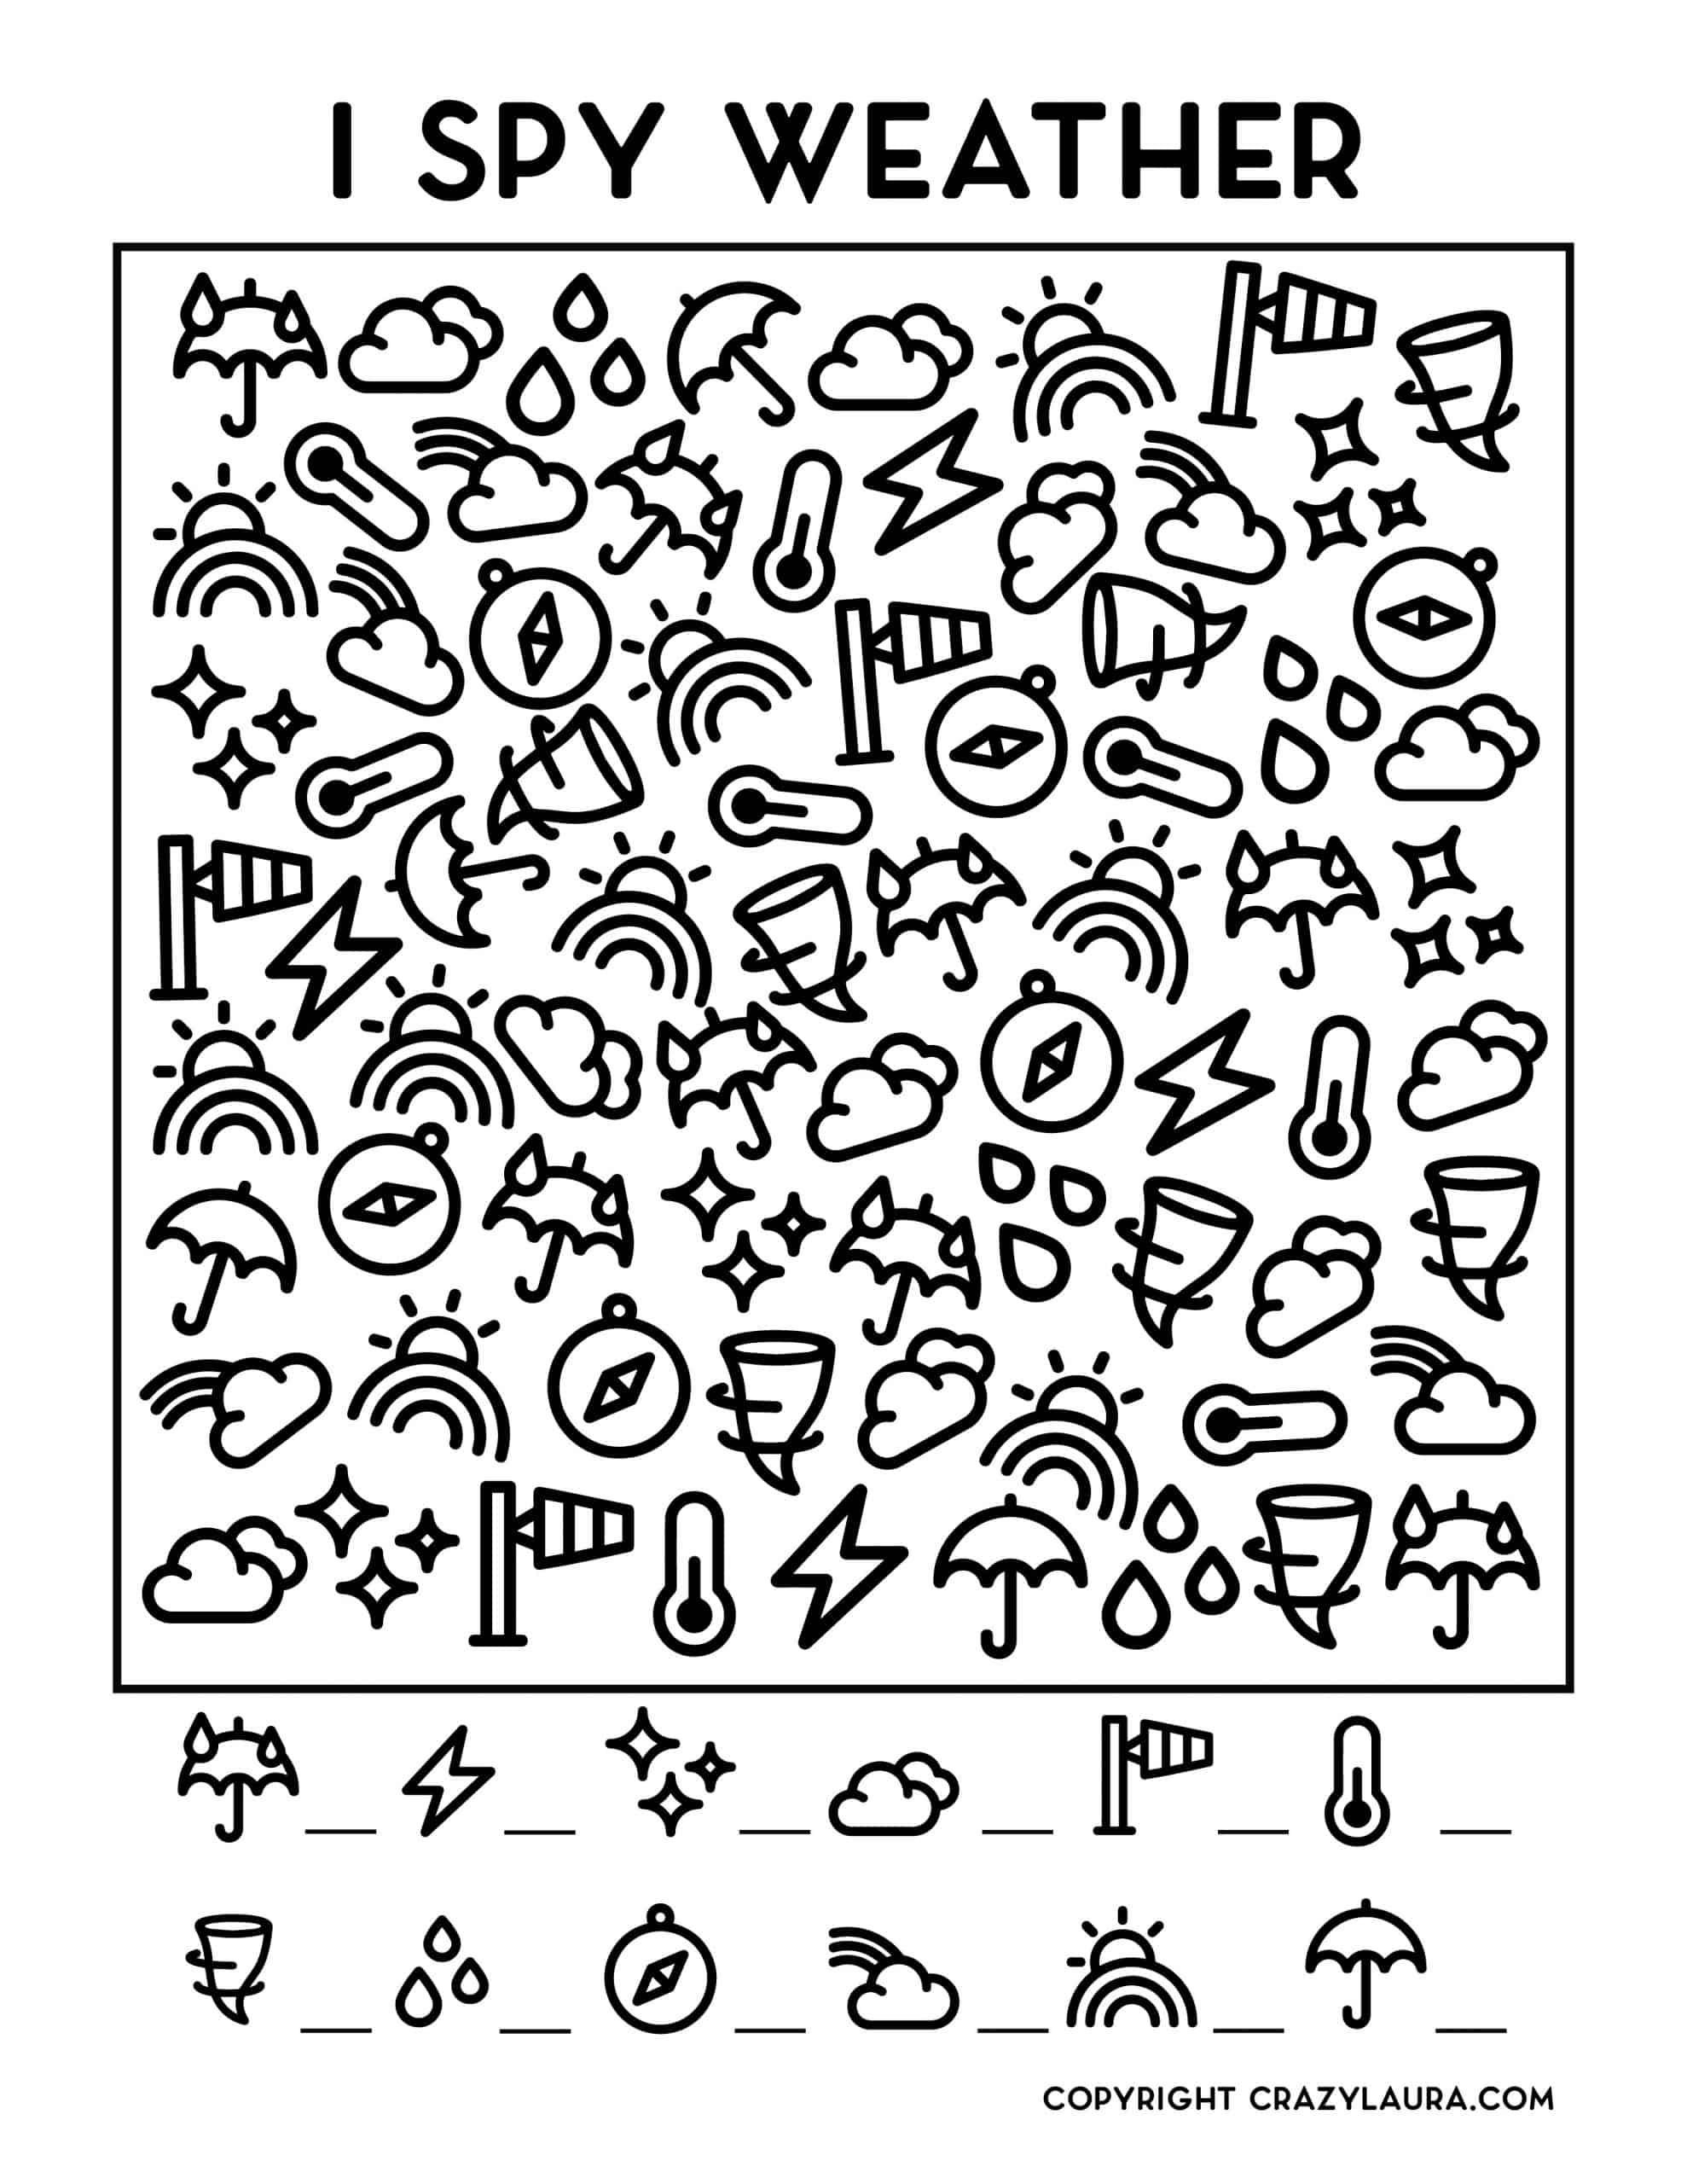 i spy printable pdf for kids